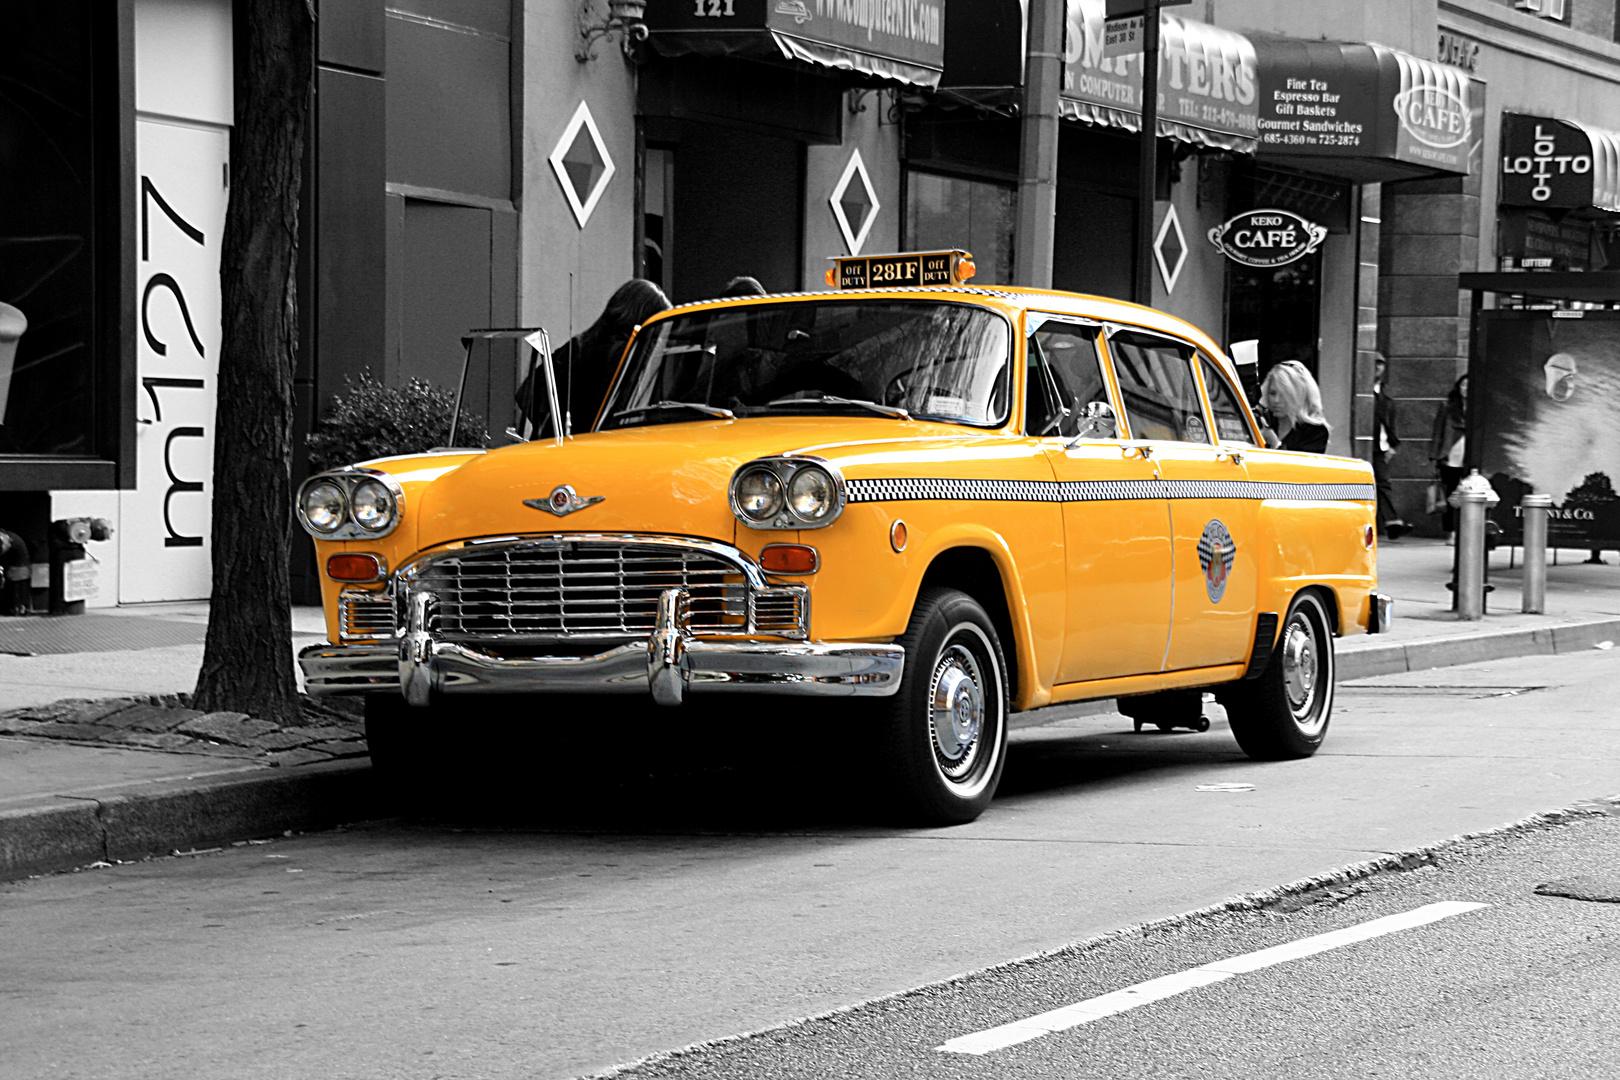 Yellow Cap - New York 2010